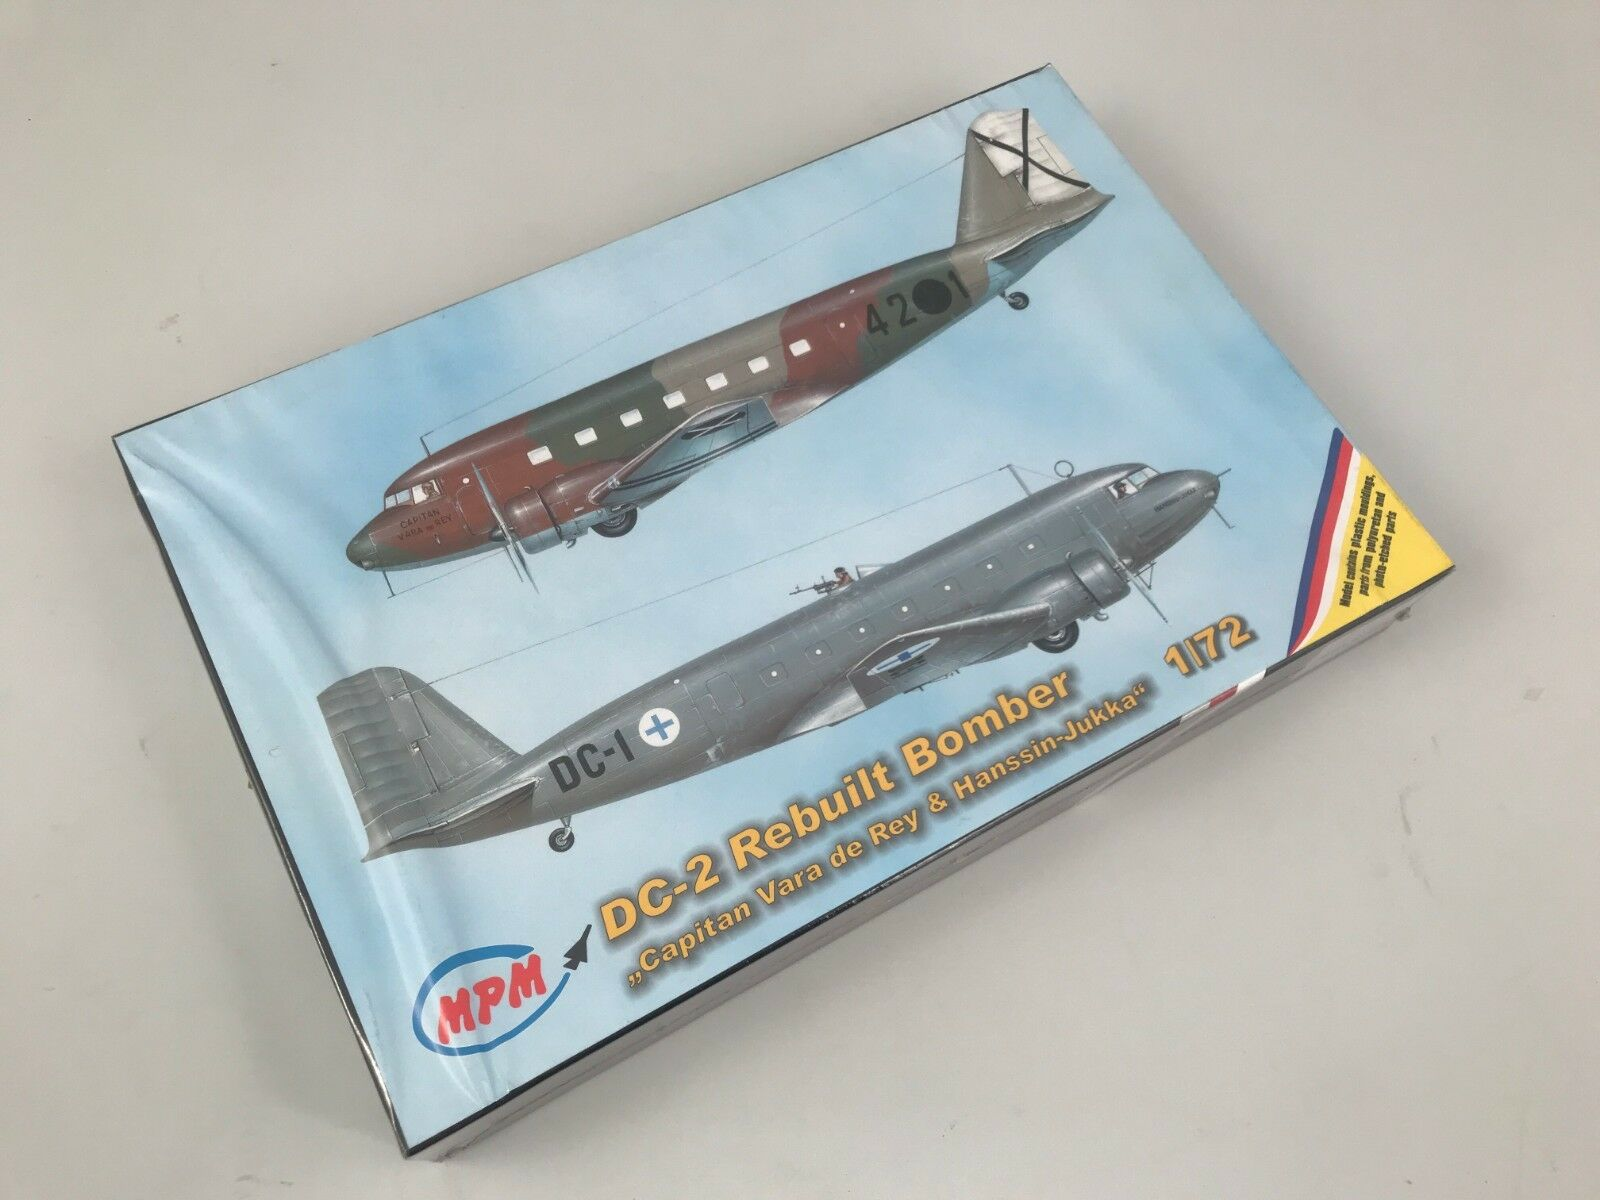 Mpm 72527 Dc-2 Rebuilt  Bomber 1 72 Modélisme  vente en ligne